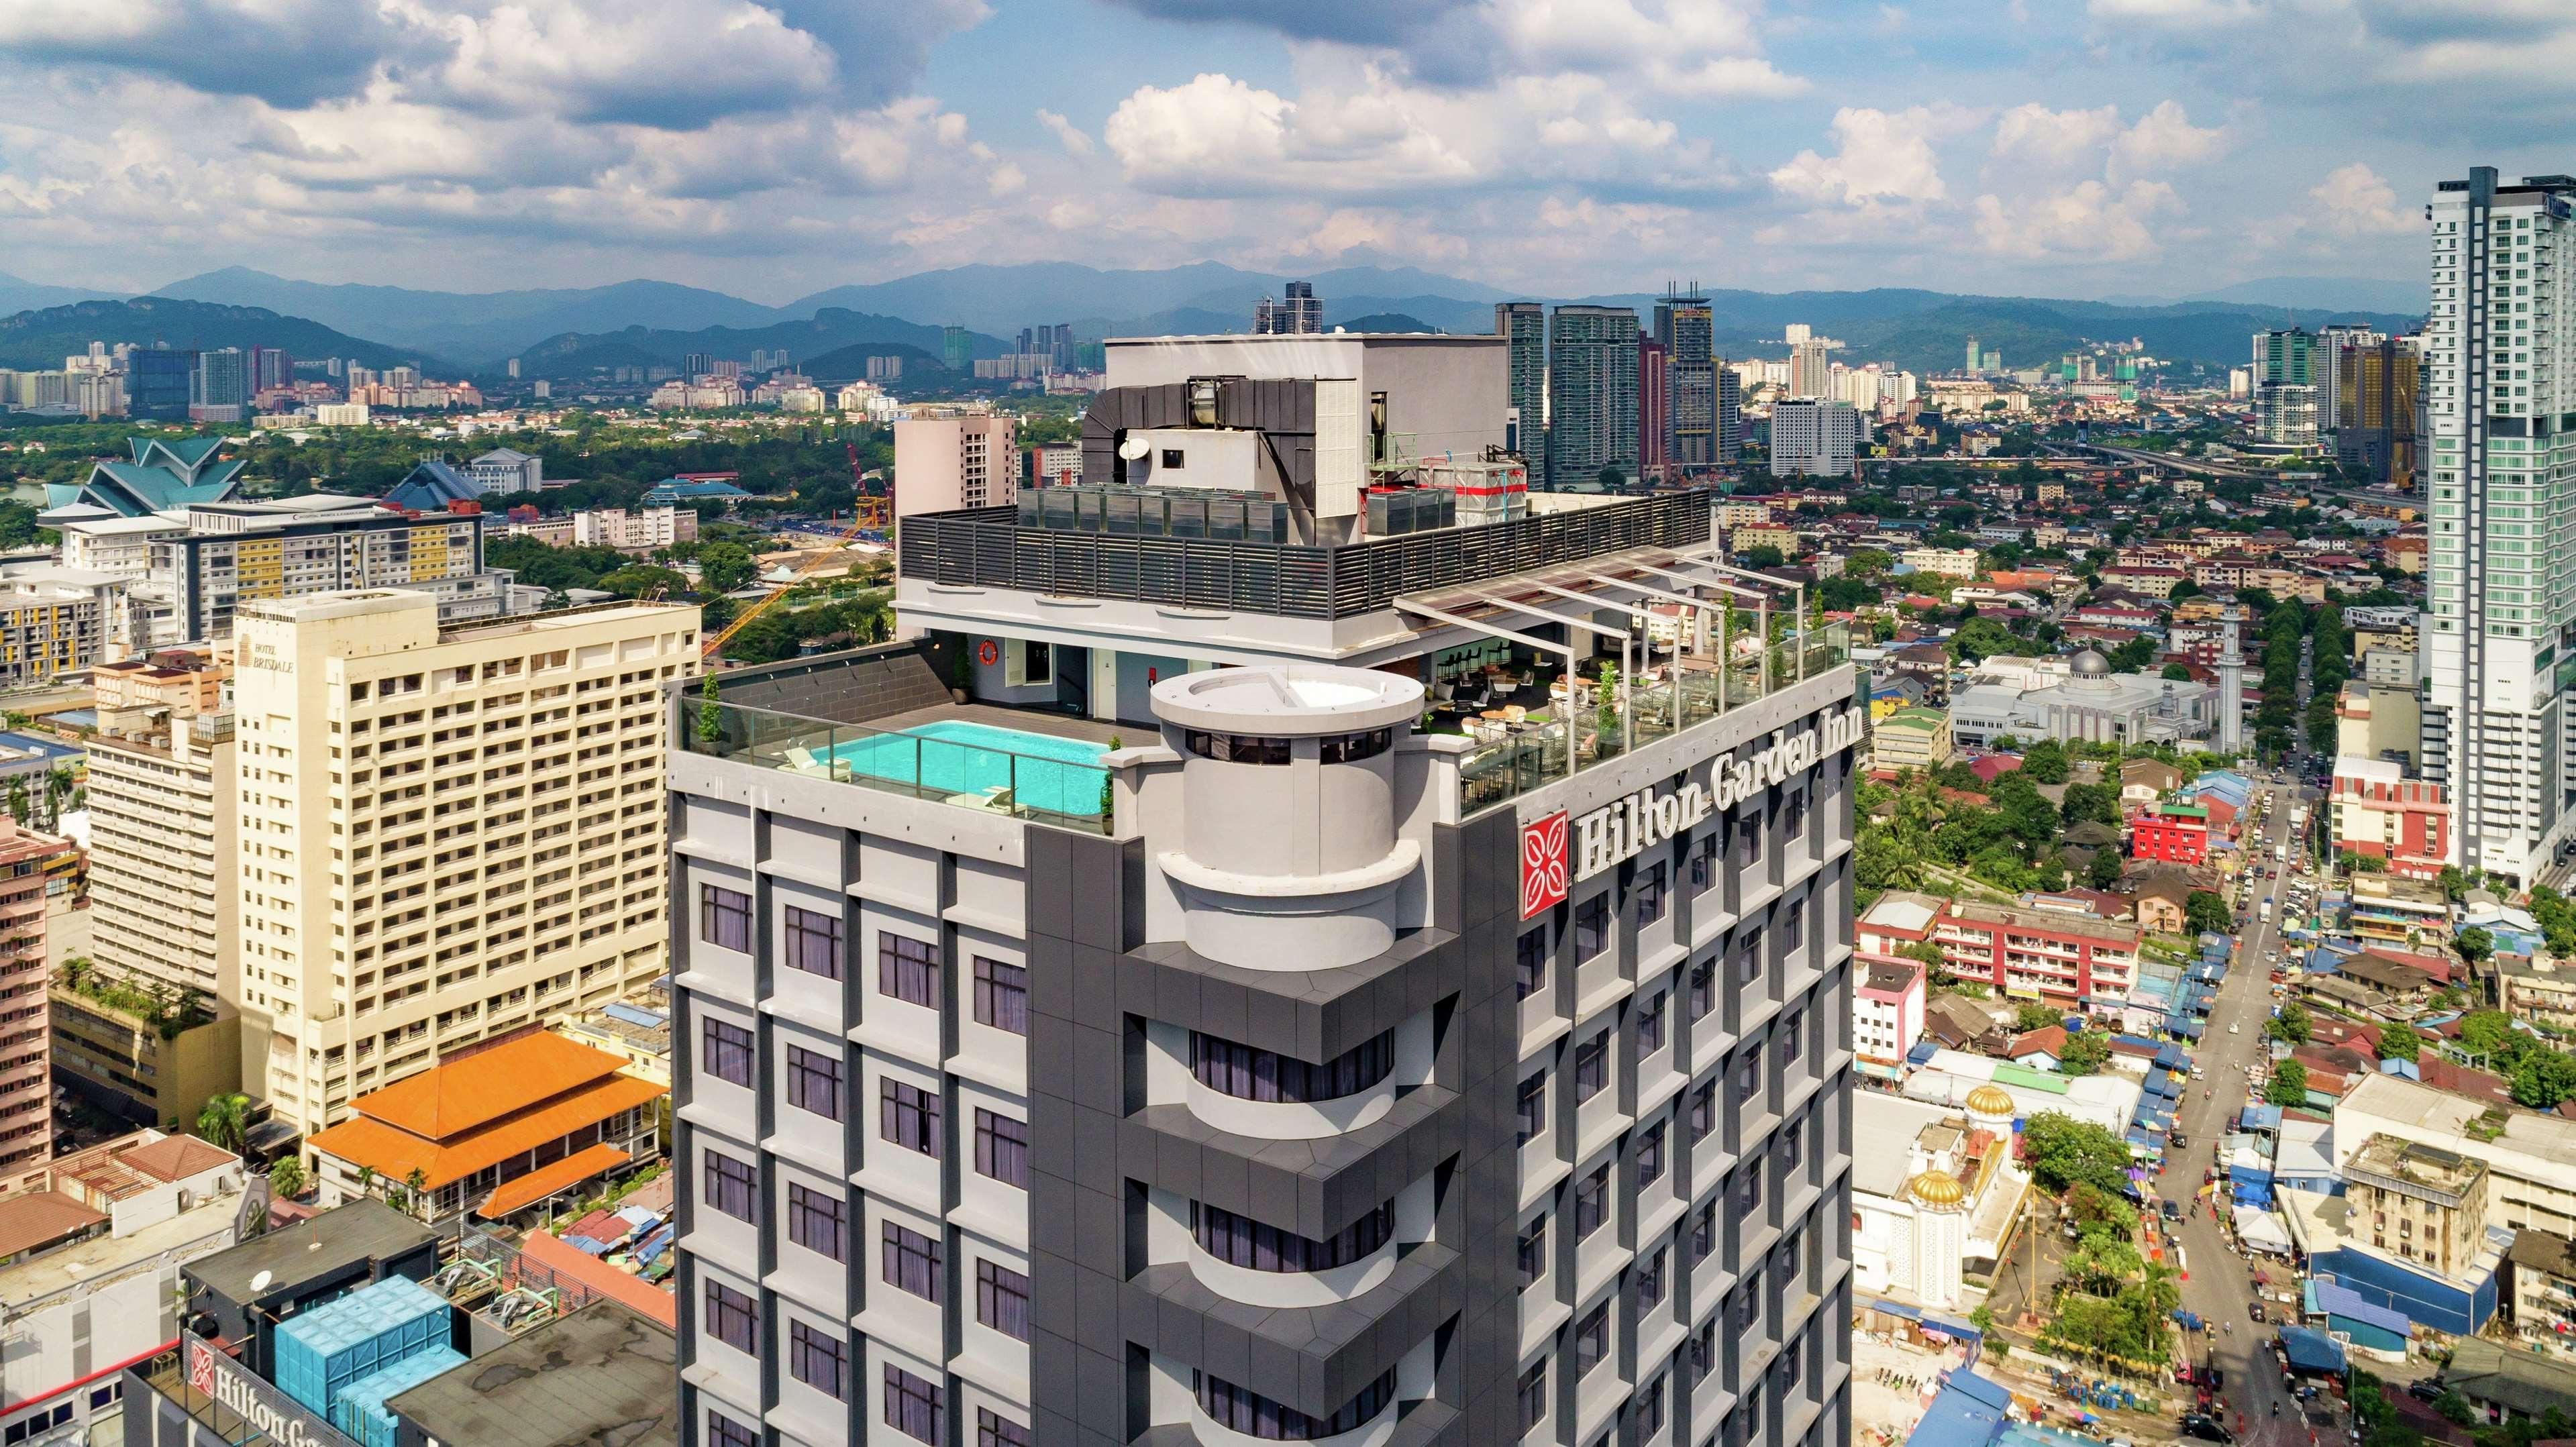 Hilton Garden Inn Kuala Lumpur South Tower, Kuala Lumpur